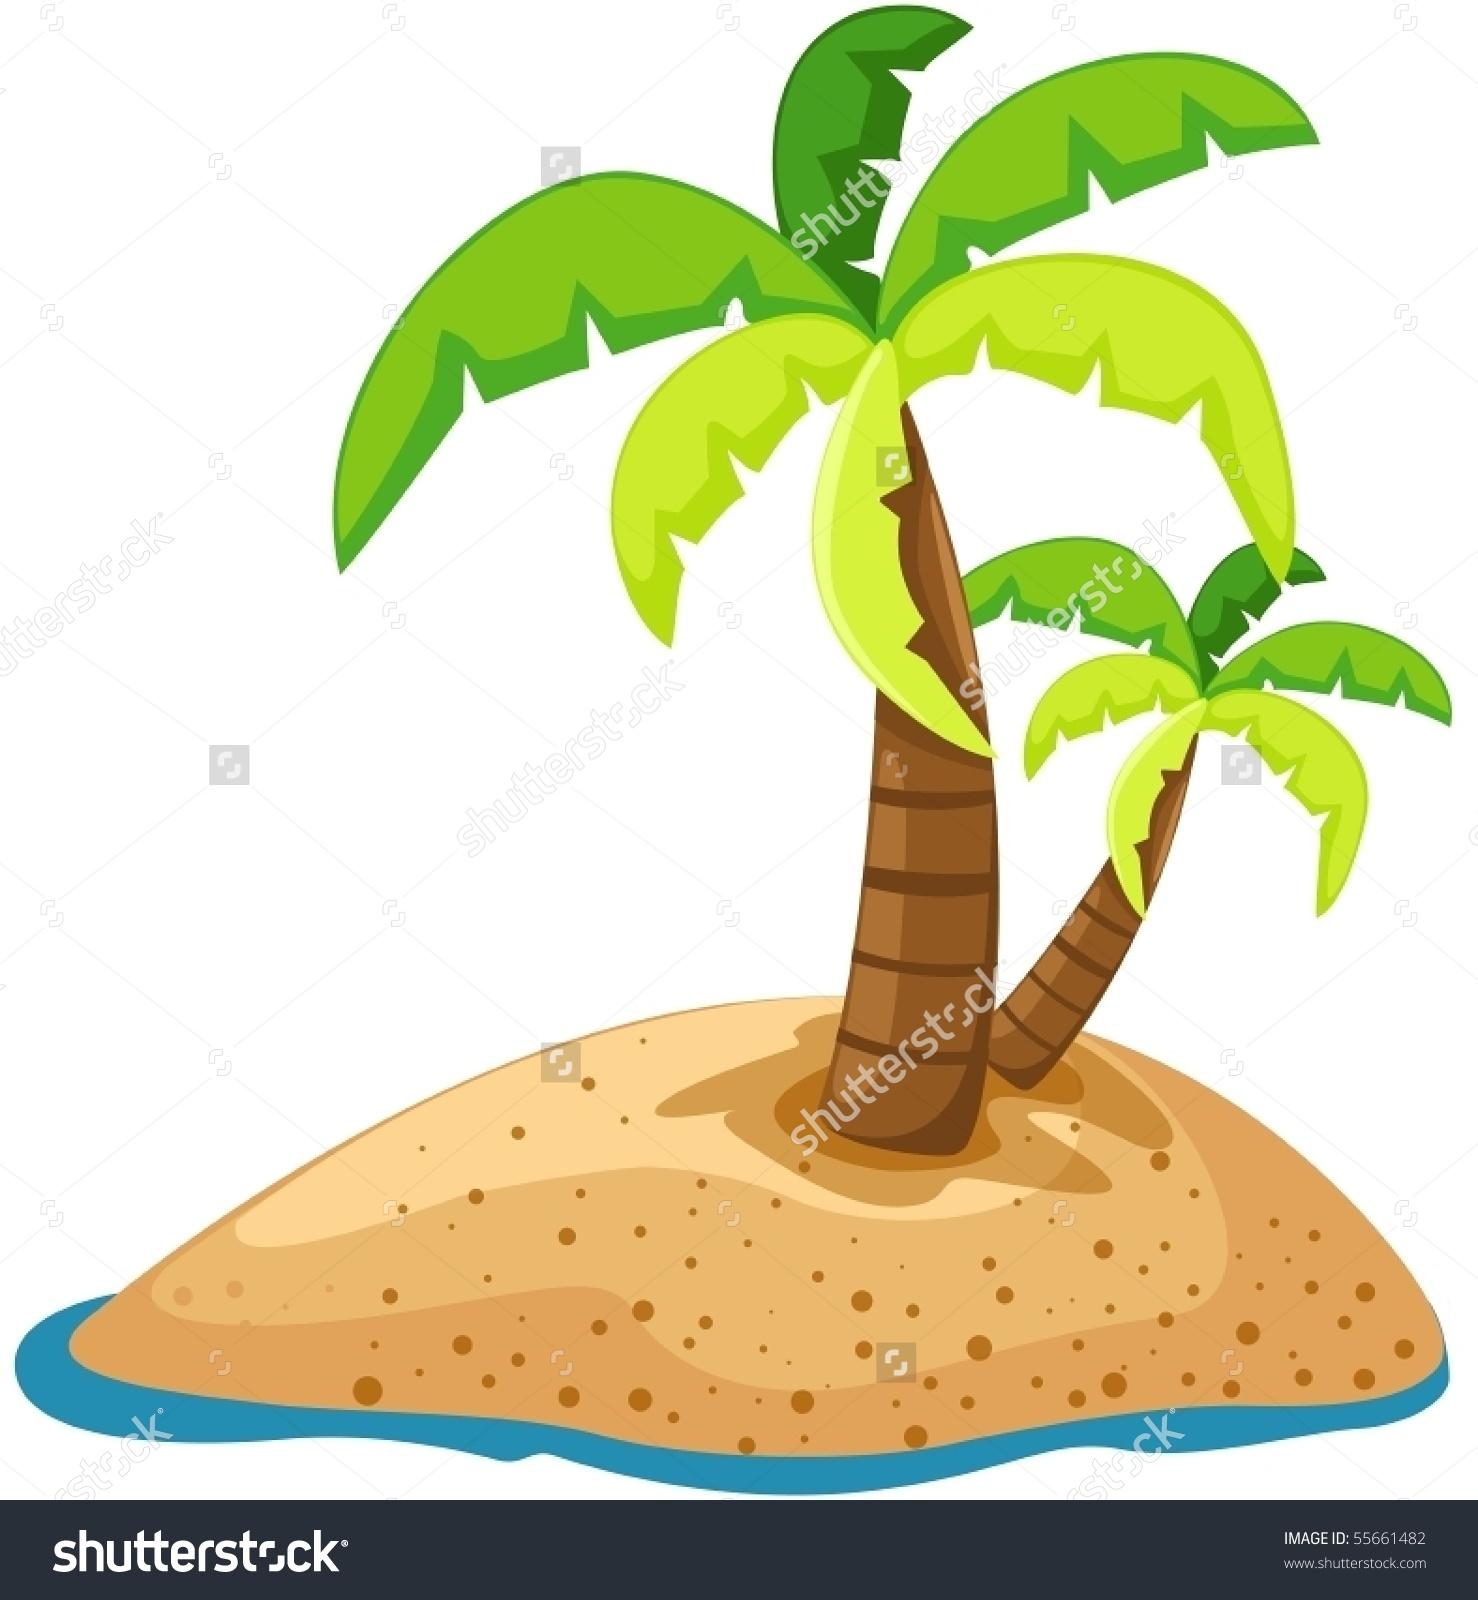 Eiland clipart palm tree beach Tree clipart island island with